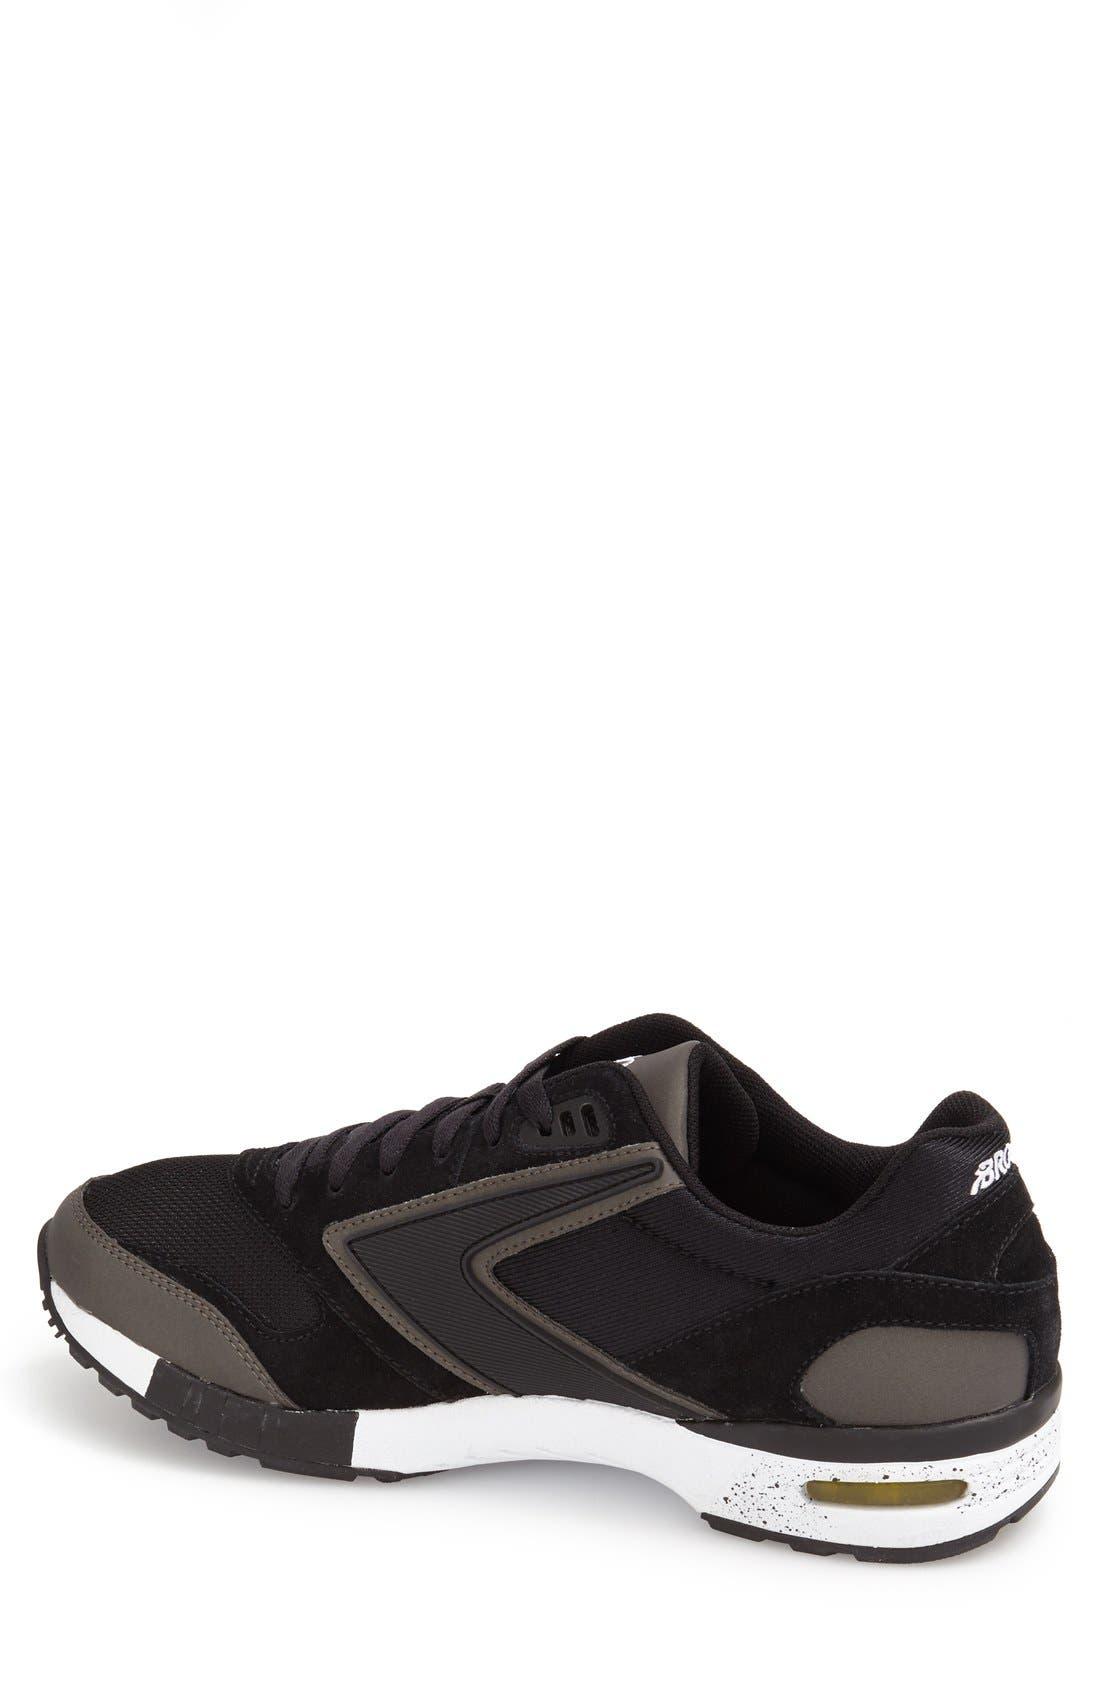 'Fusion' Sneaker,                             Alternate thumbnail 2, color,                             012